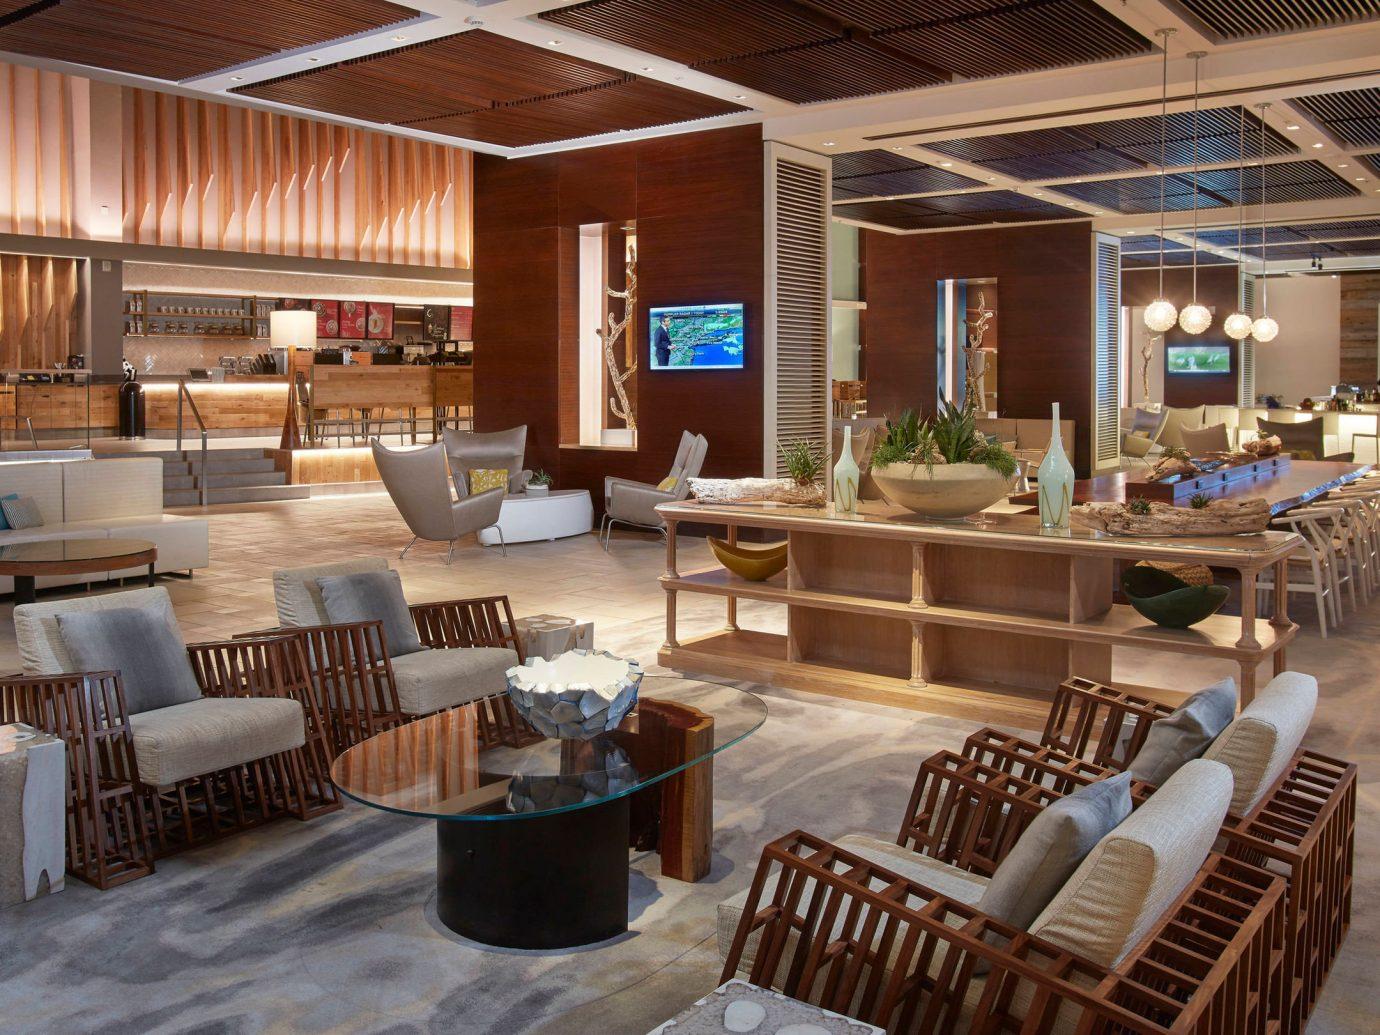 Aruba caribbean Hotels indoor floor window ceiling chair room Living Lobby interior design furniture living room restaurant Dining wood area Island